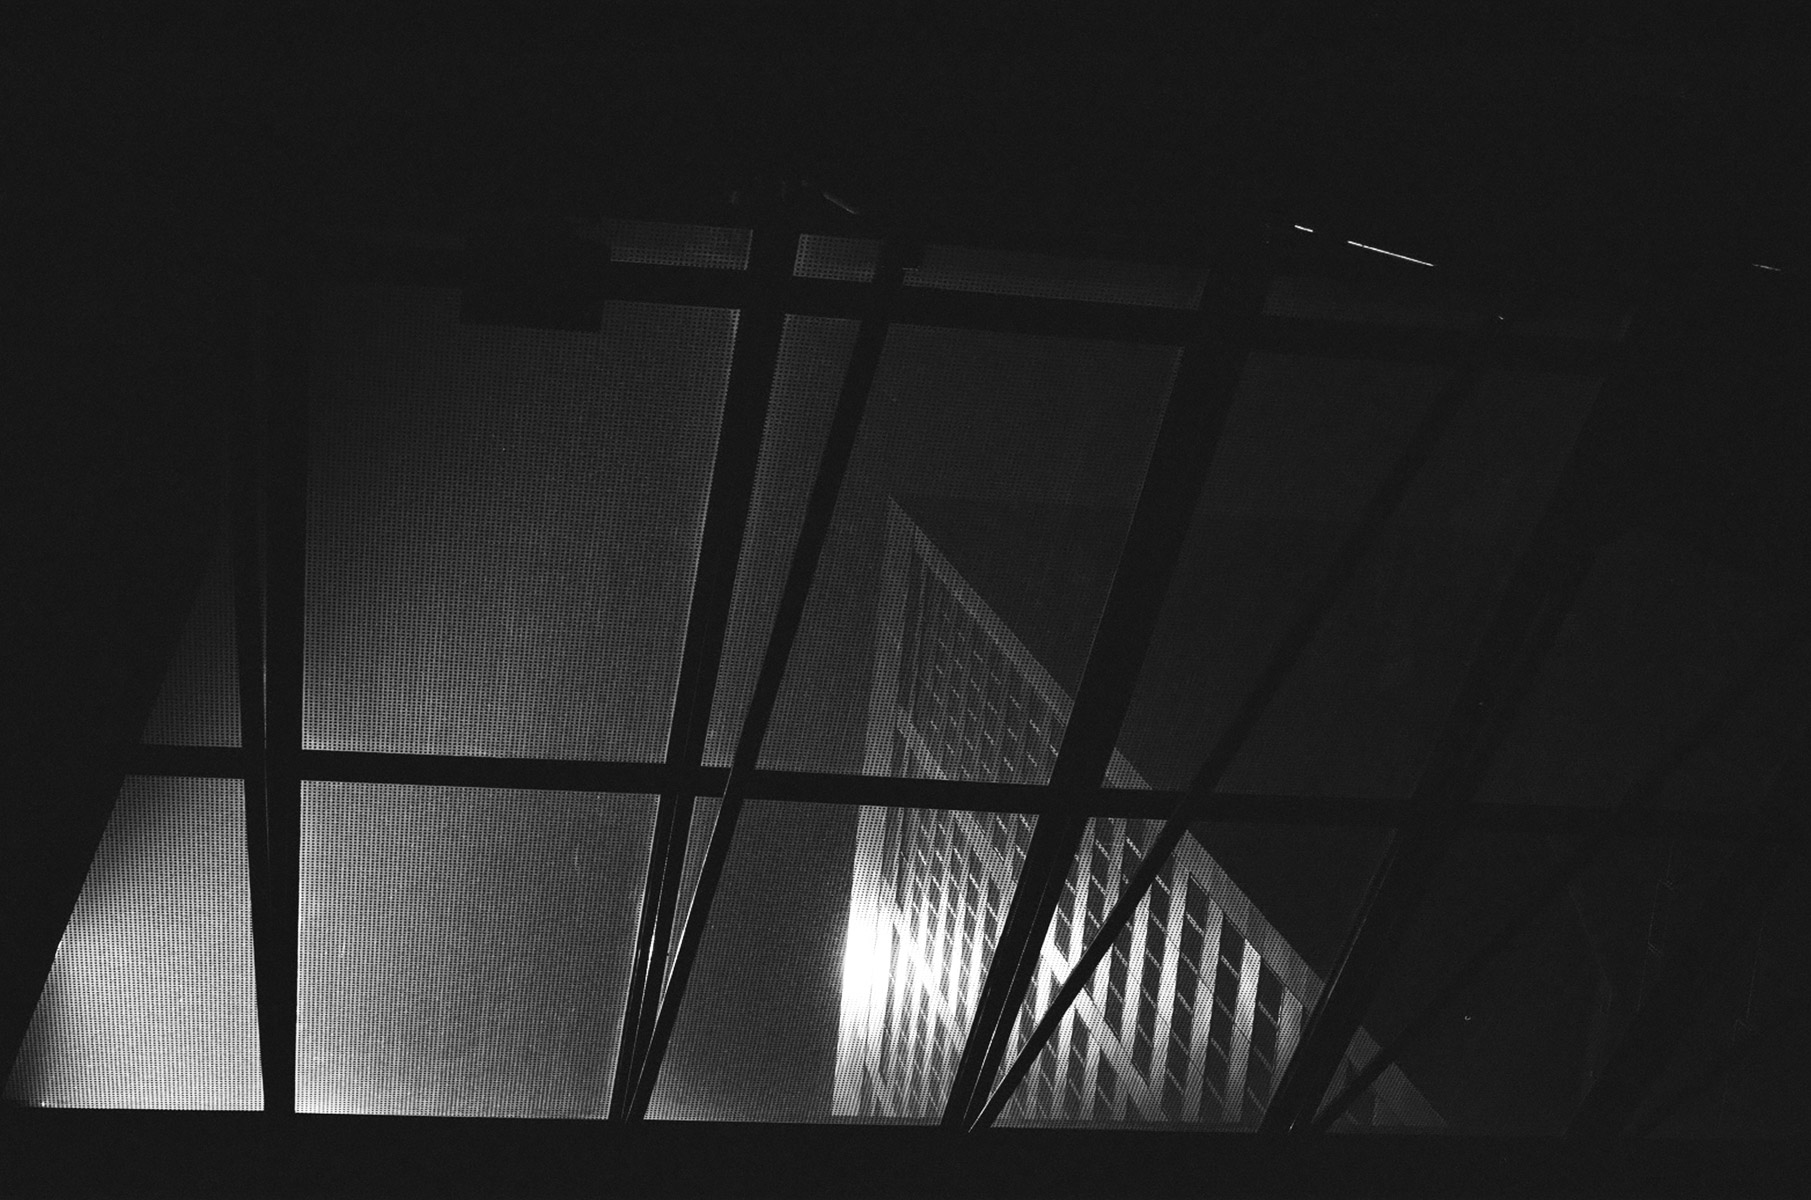 5 Frames With... JCH Streetpan 400 (EI 400 / 35mm format / Nikon FM2n) - by Paul Sutton